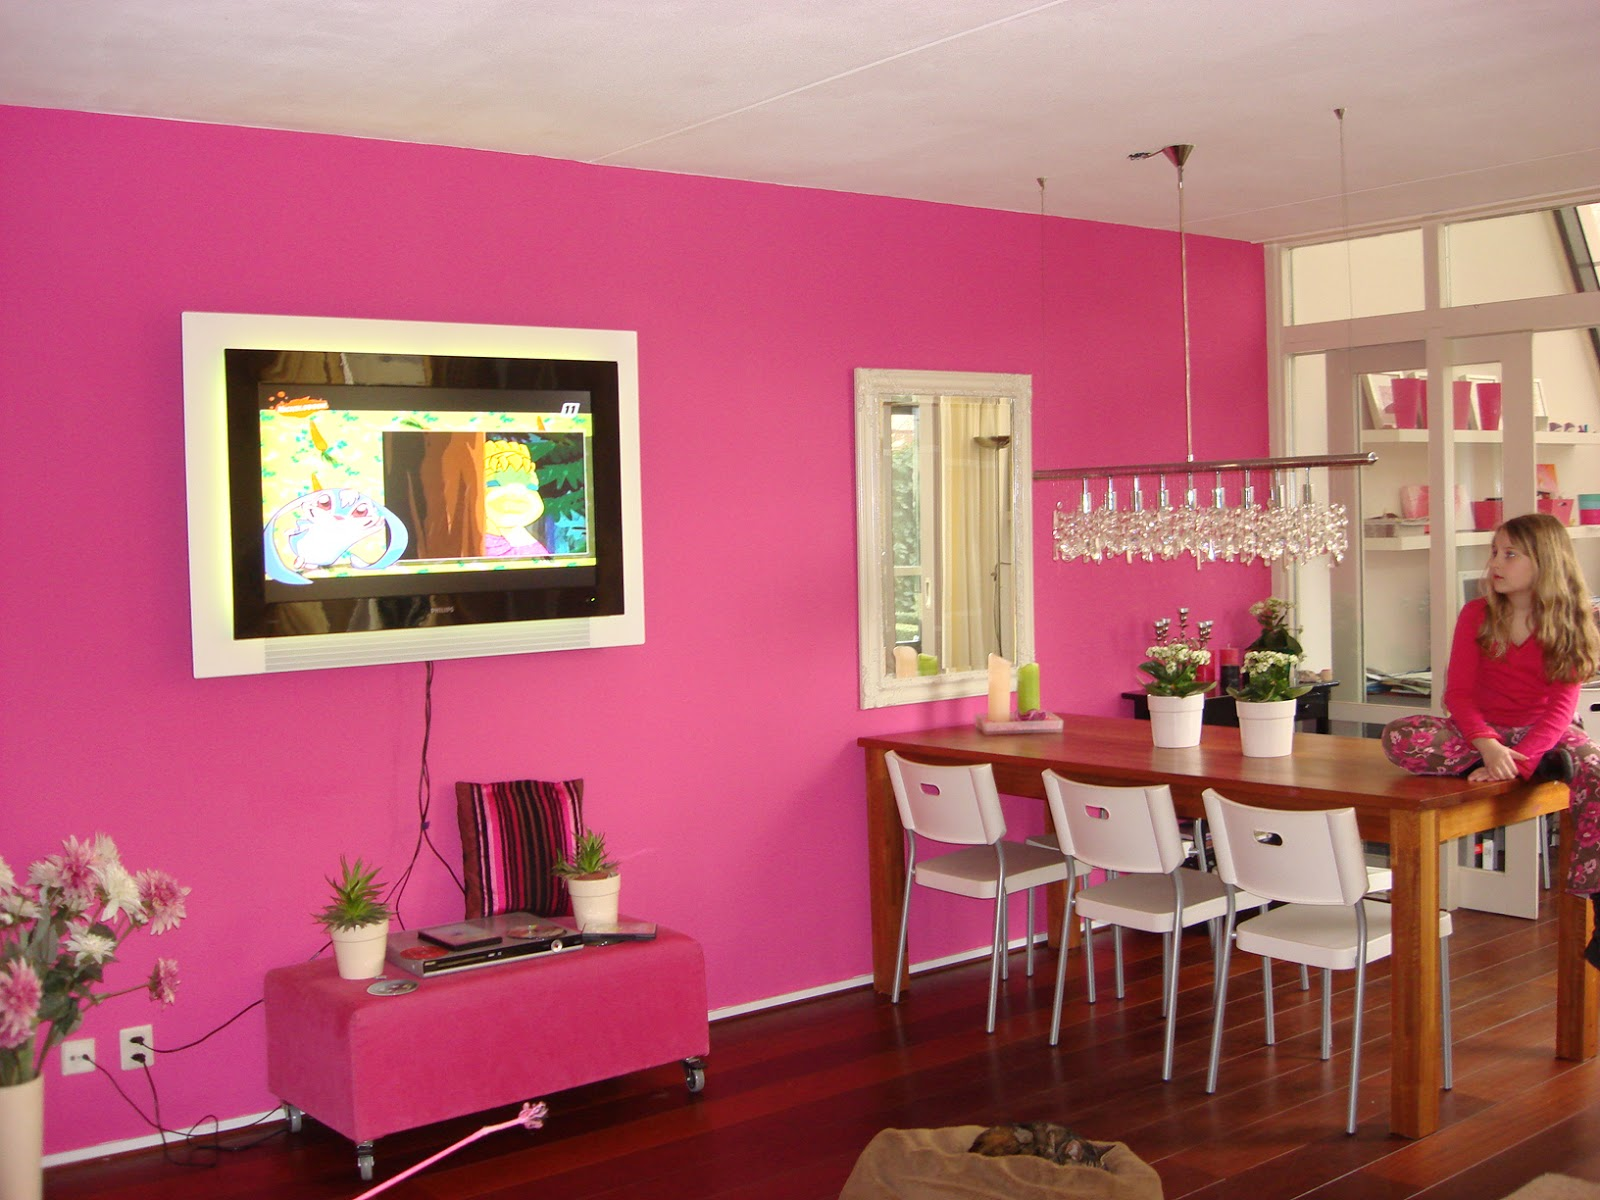 Tips memilih warna cat rumah bagus dan minimalis - Contoh Warna Cat Ruang Makan